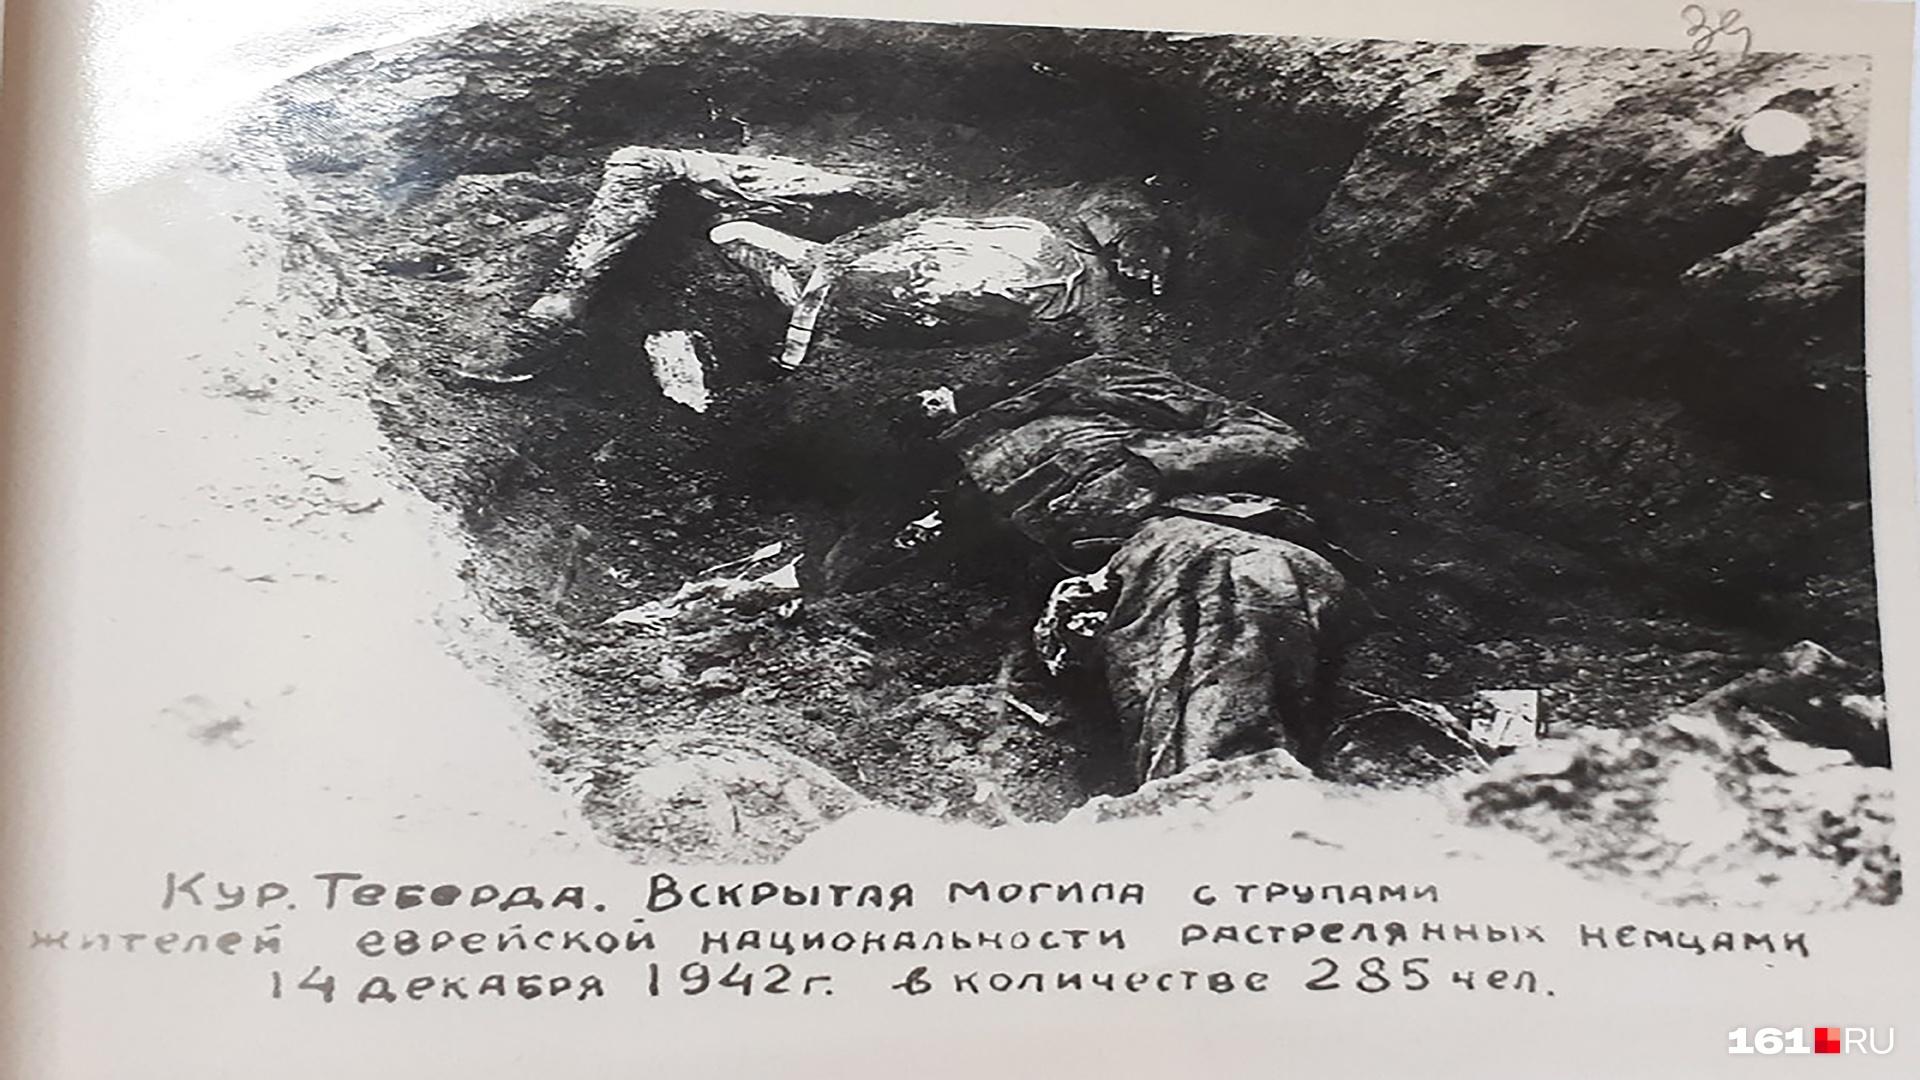 Владислав Федяев хранит множество материалов о трагедии в Теберде